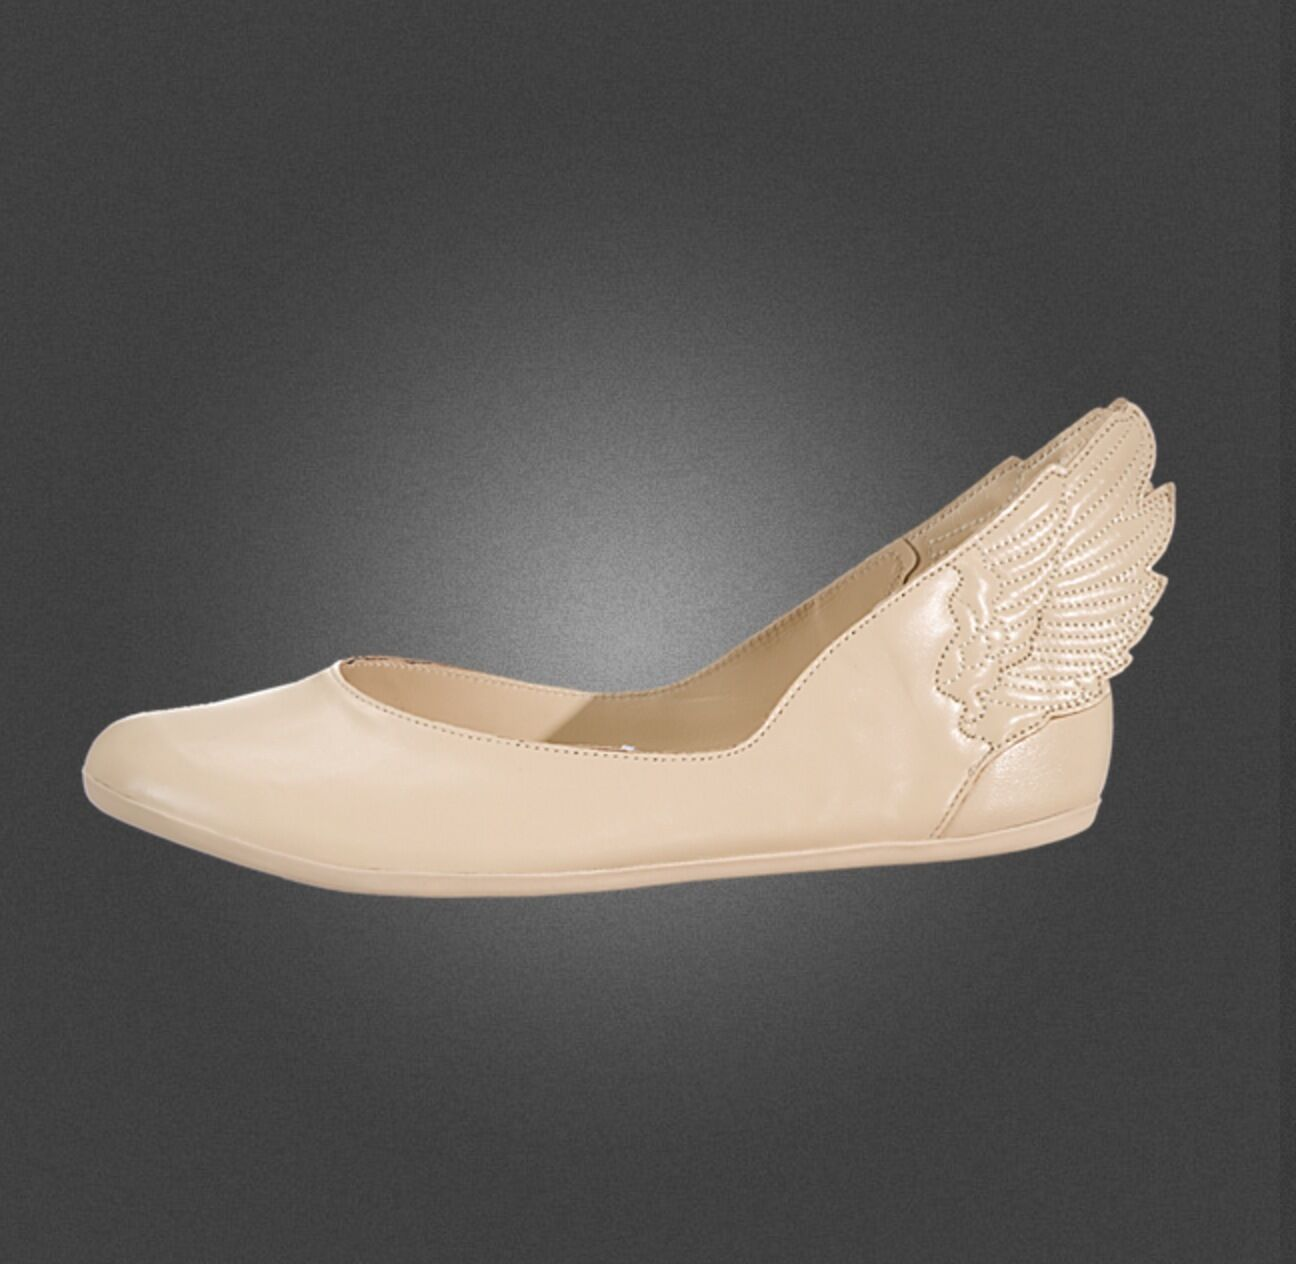 NEW 5 adidas JEREMY SCOTT Womens Js Q23666 Wings Ballerinas Dune/Running White Q23666 Js cf8d48